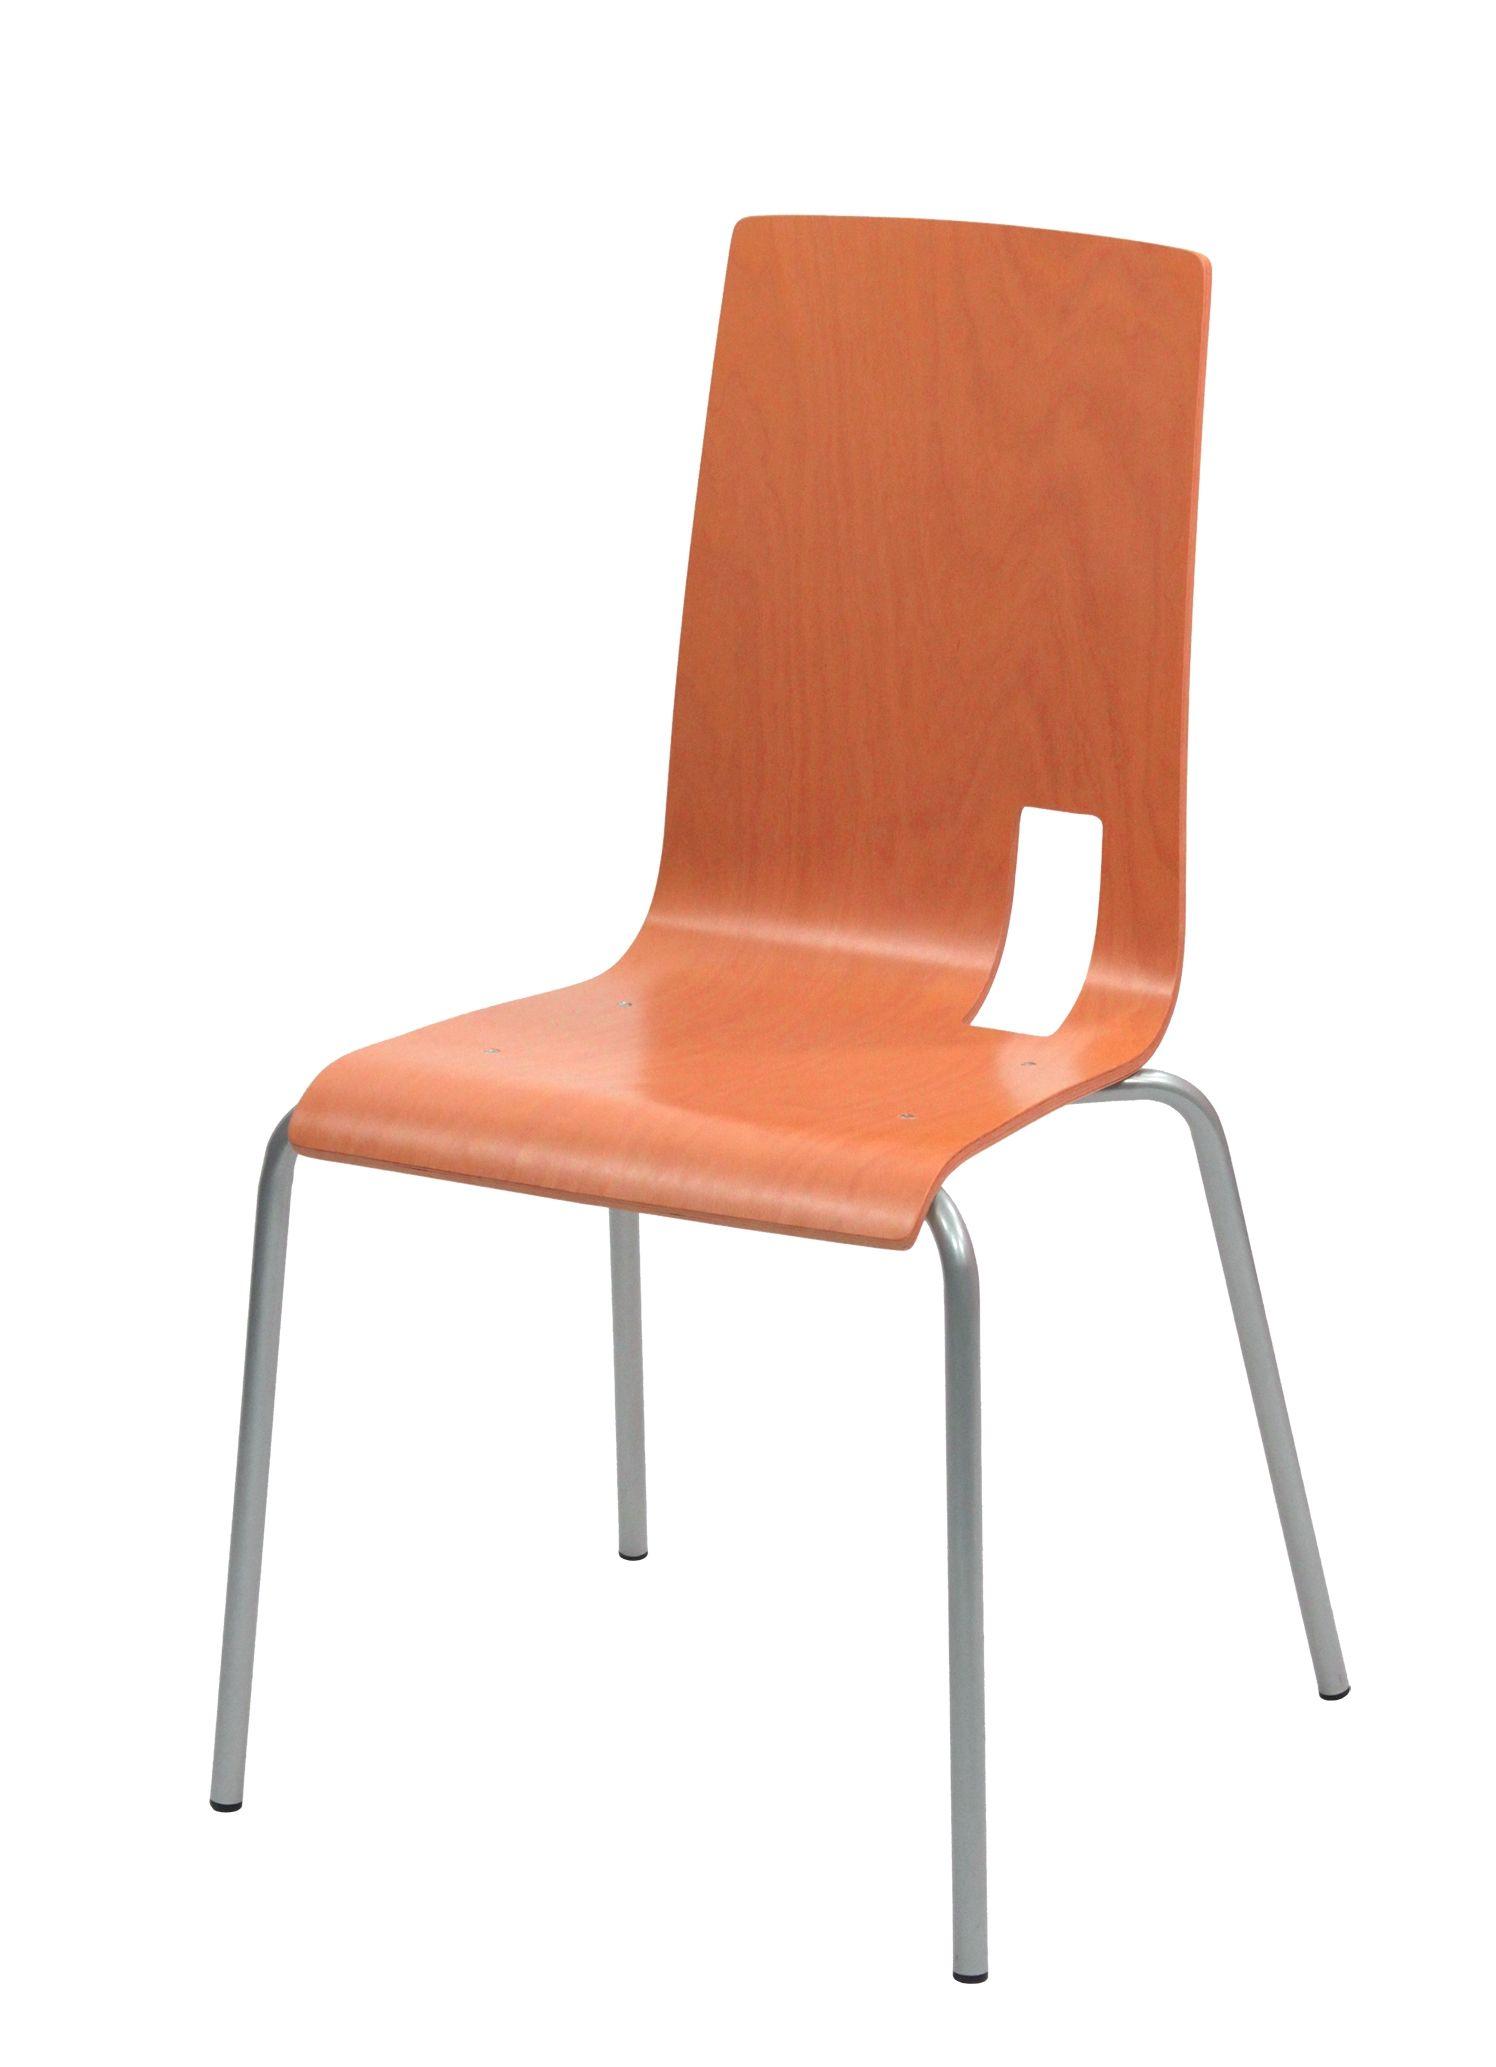 CHAISE SODA IXIA EMPILABLE COQUE ORANGE #chaise #chair #fauteuil #siegerestauration #equipementrestaurant #empilable